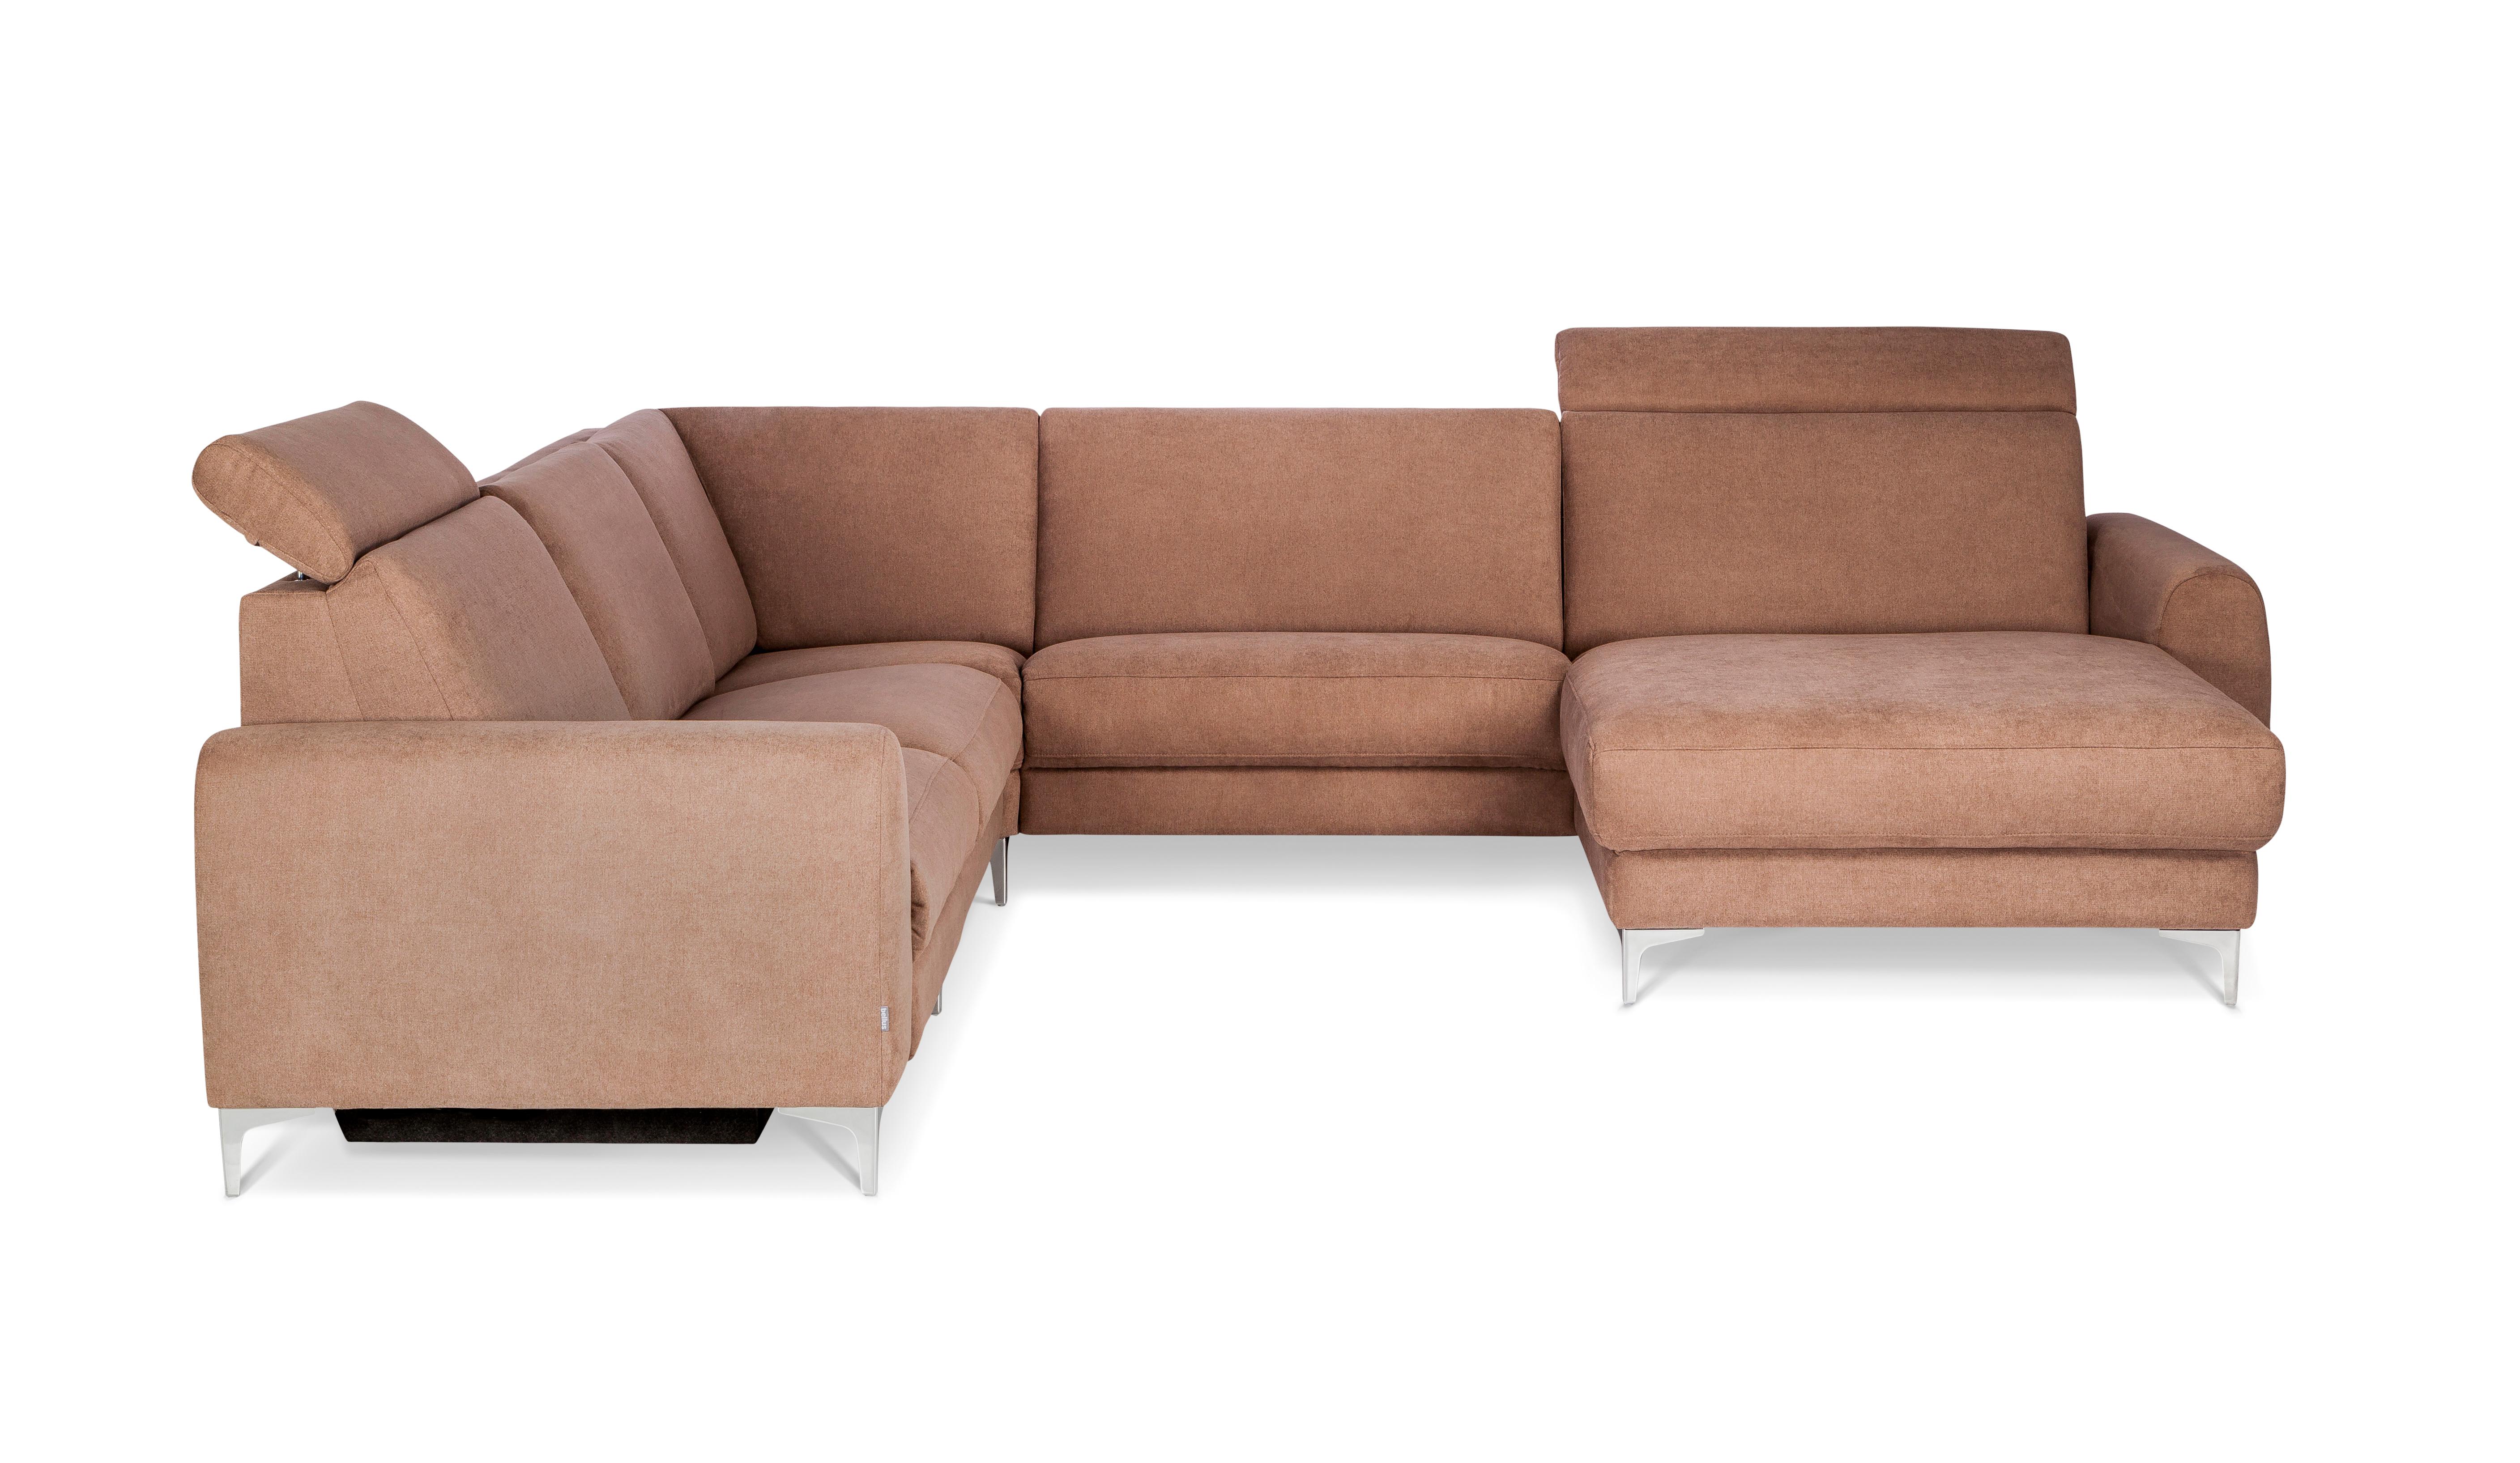 Hilton Bellus Furniture